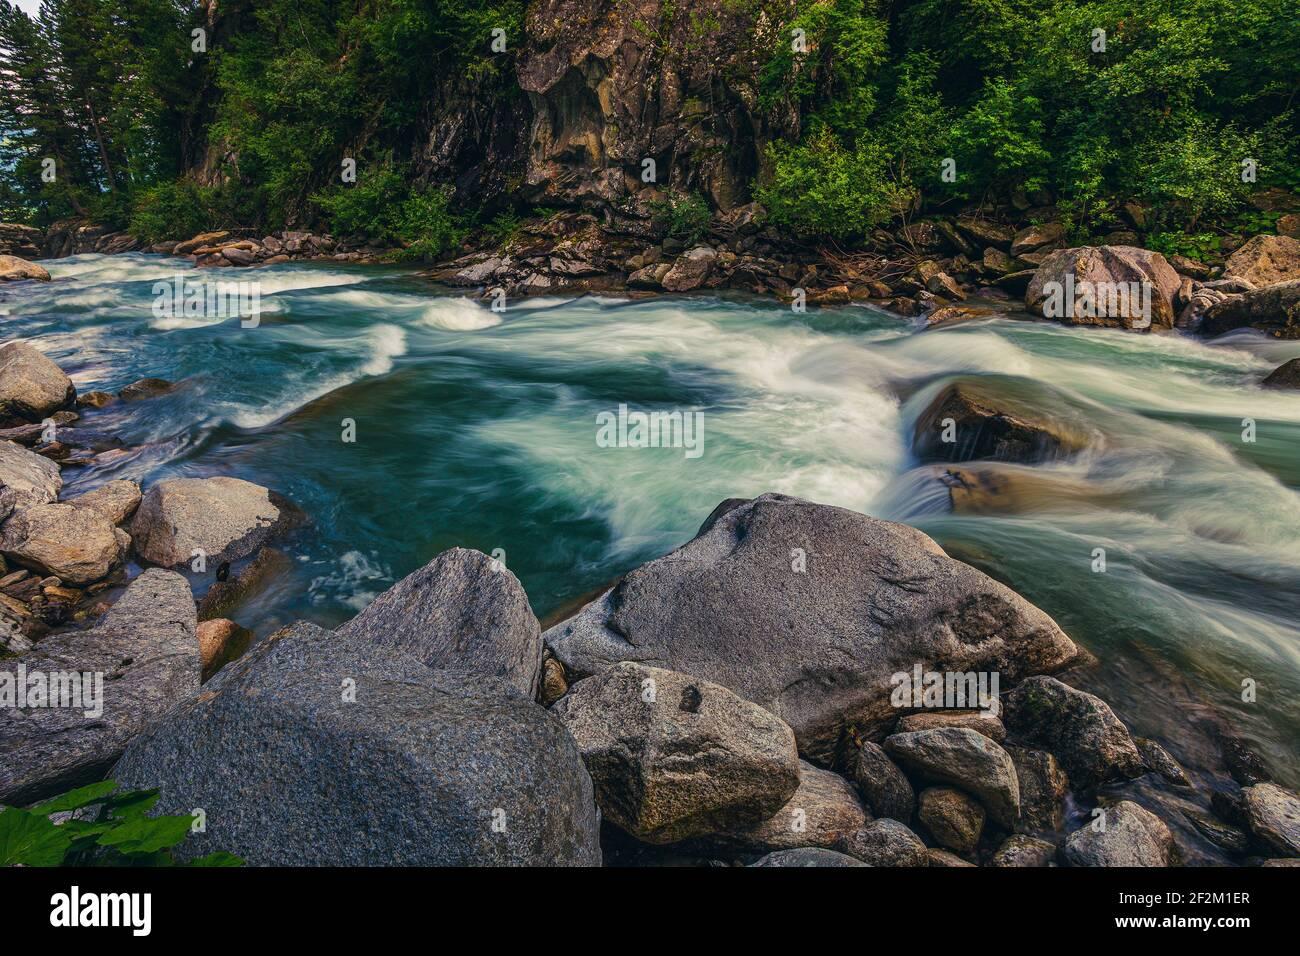 The river Krimmler Ache in the Hohe Tauern National Park in Austria. The Krimmler Ache forms the Krimmler waterfalls. Stock Photo